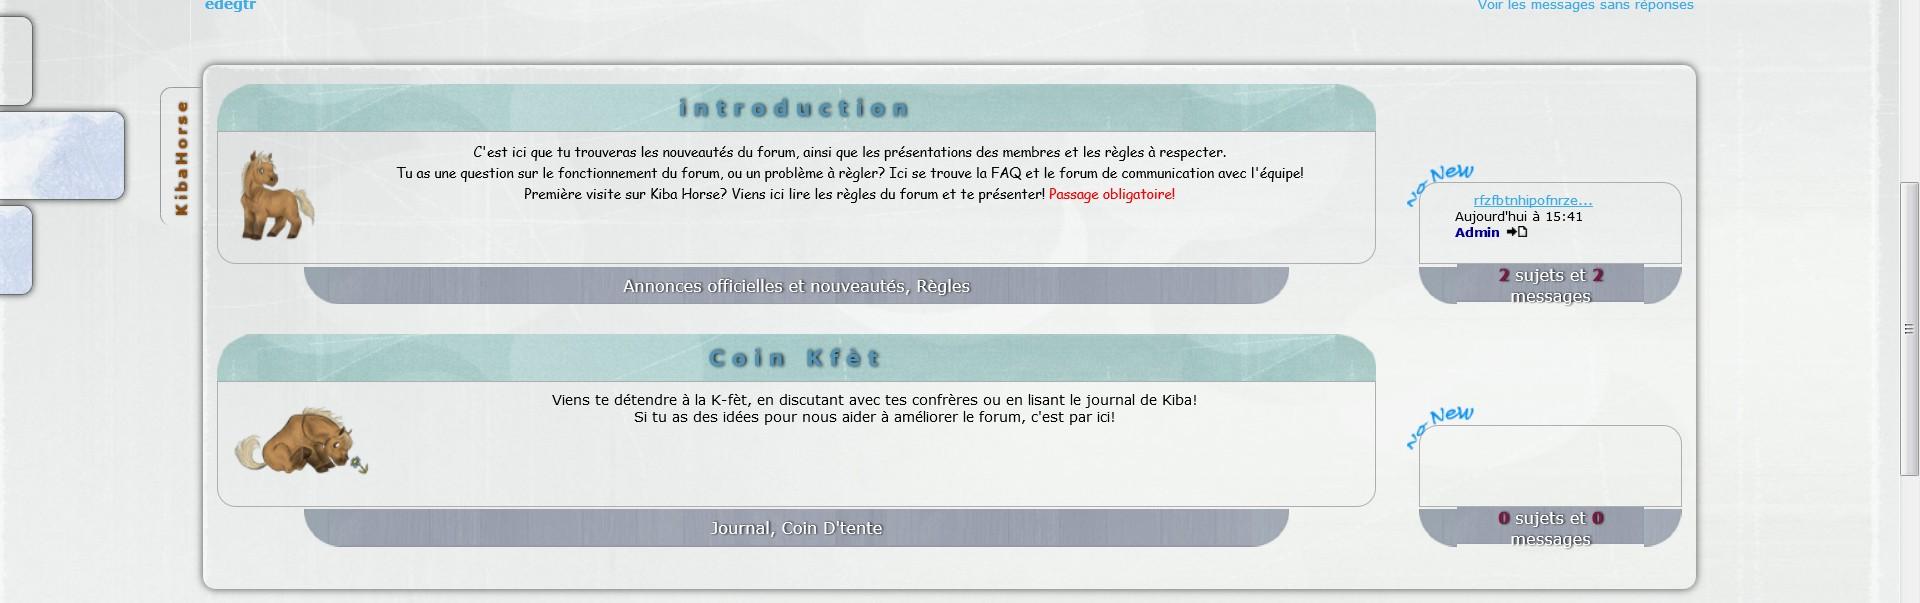 Le design Imprec12